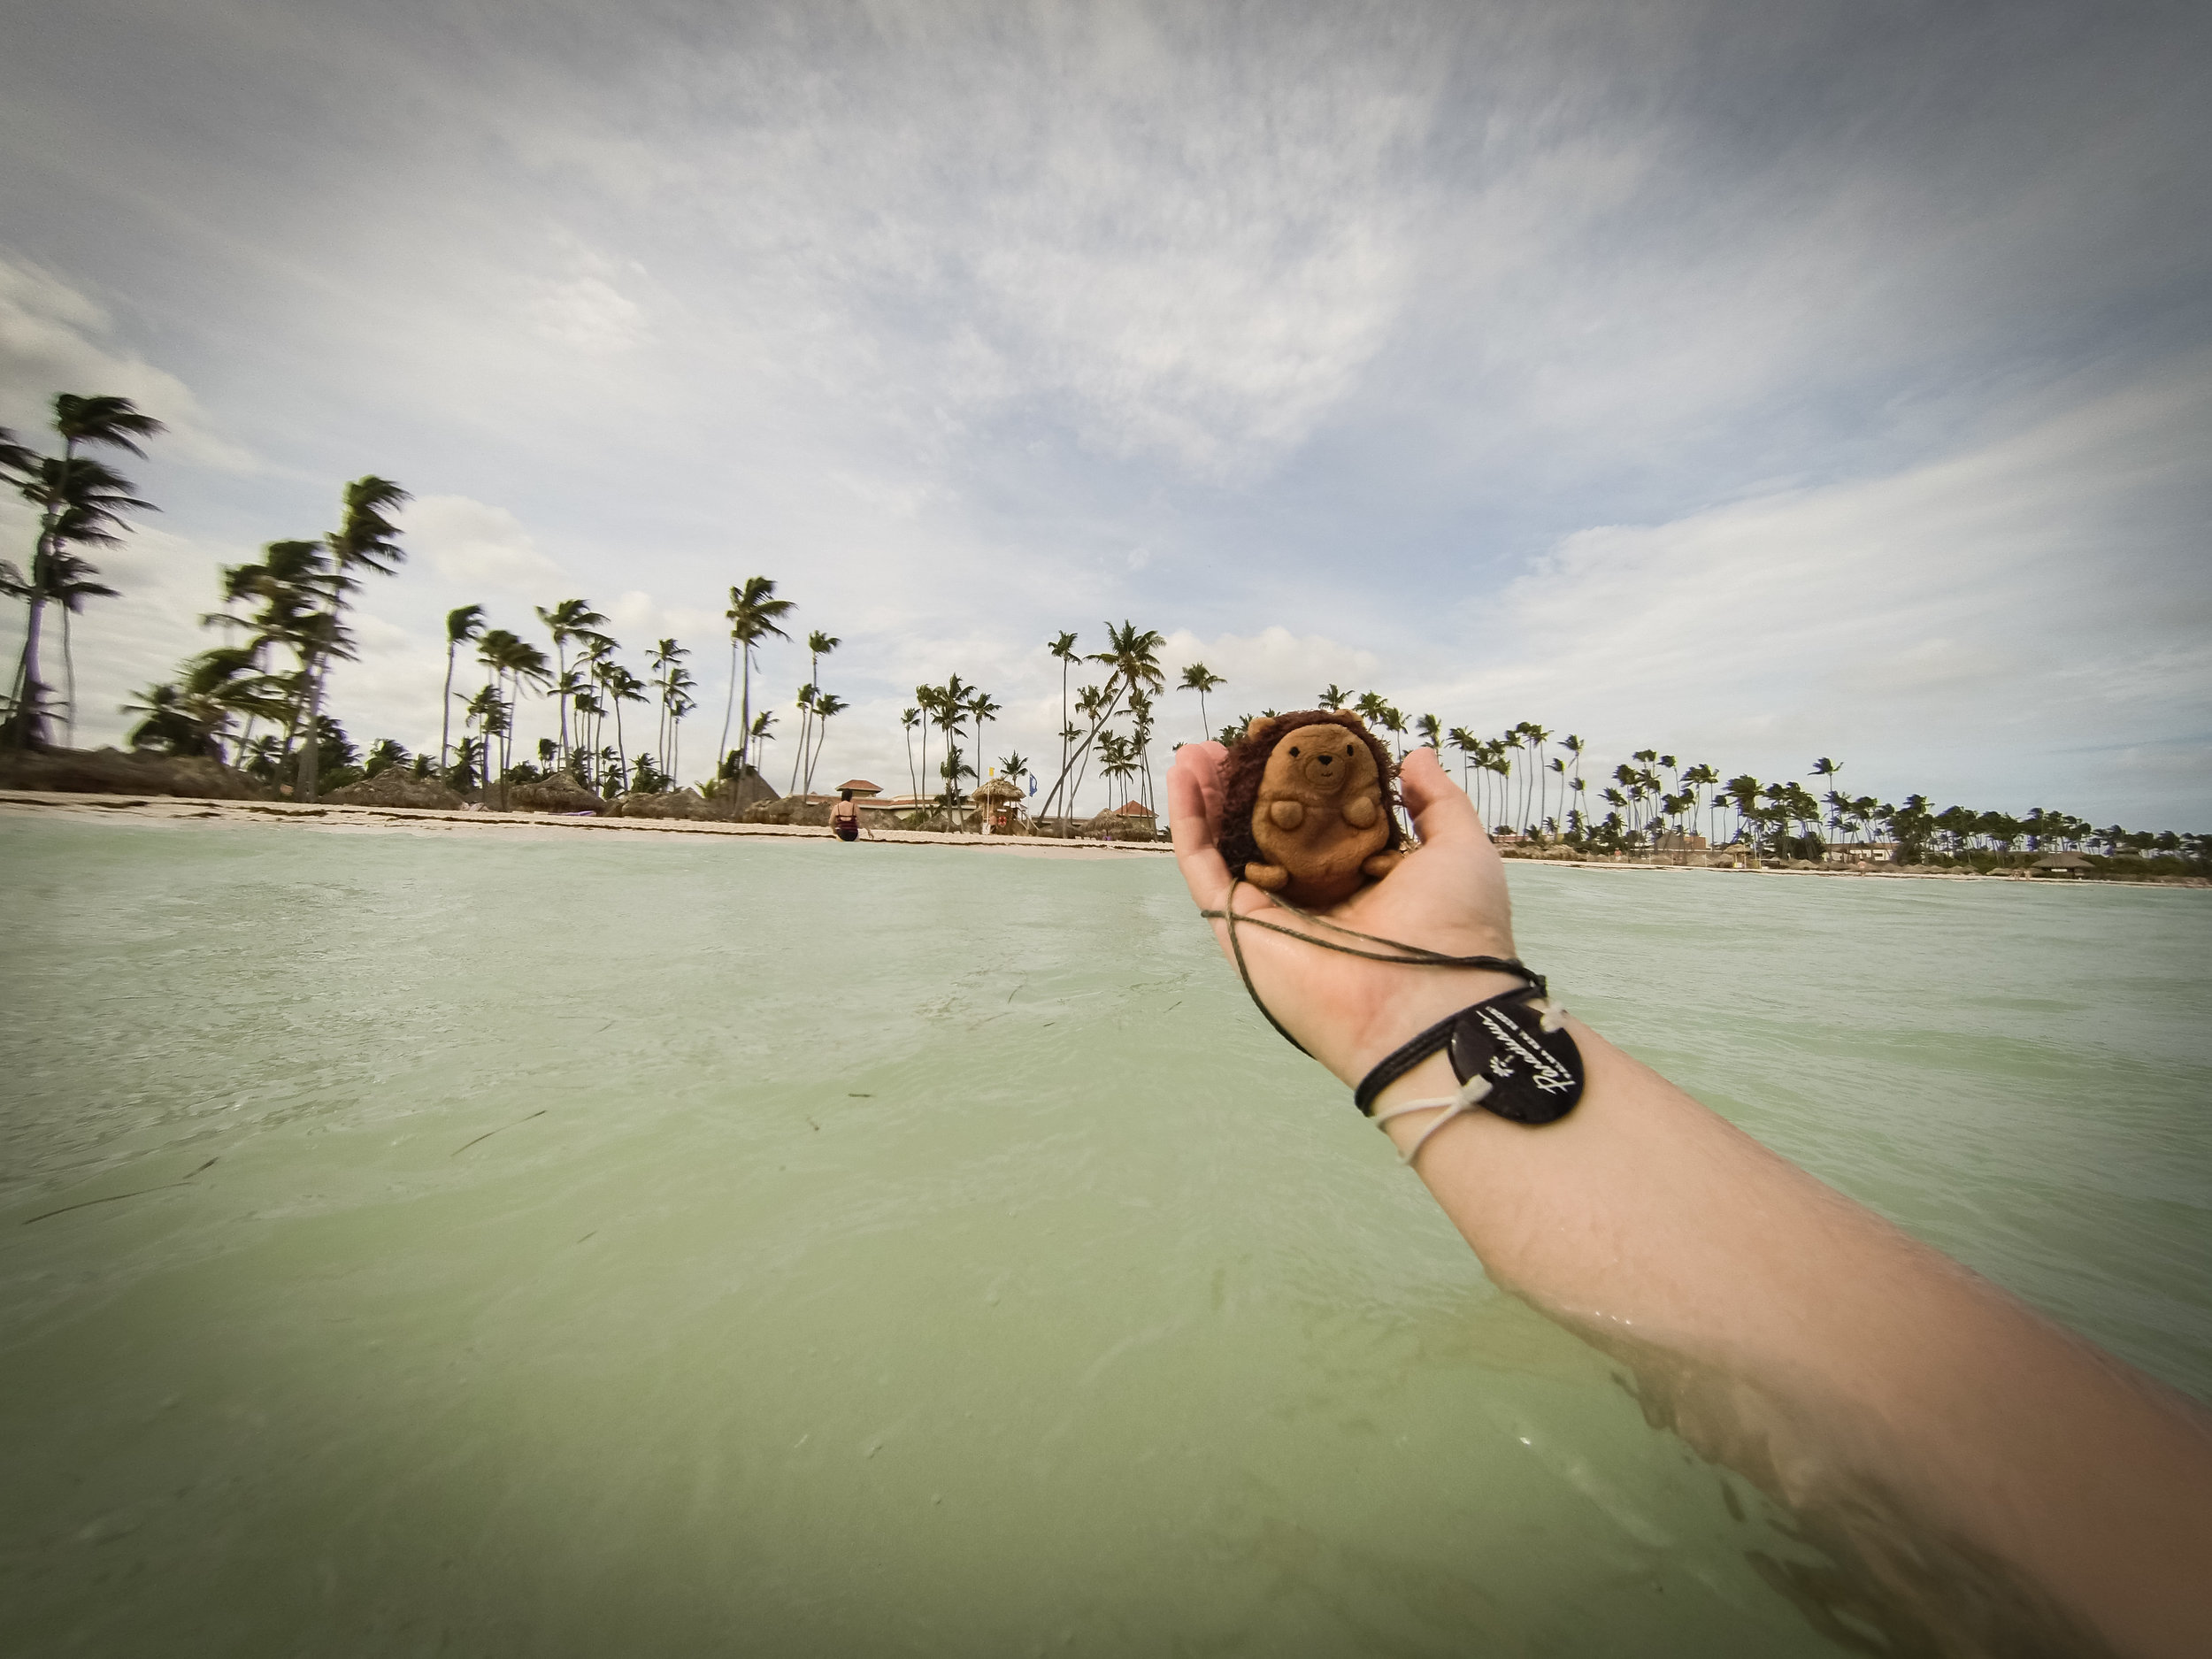 Sosik-Hamor Holiday in Punta Cana (December 2012)